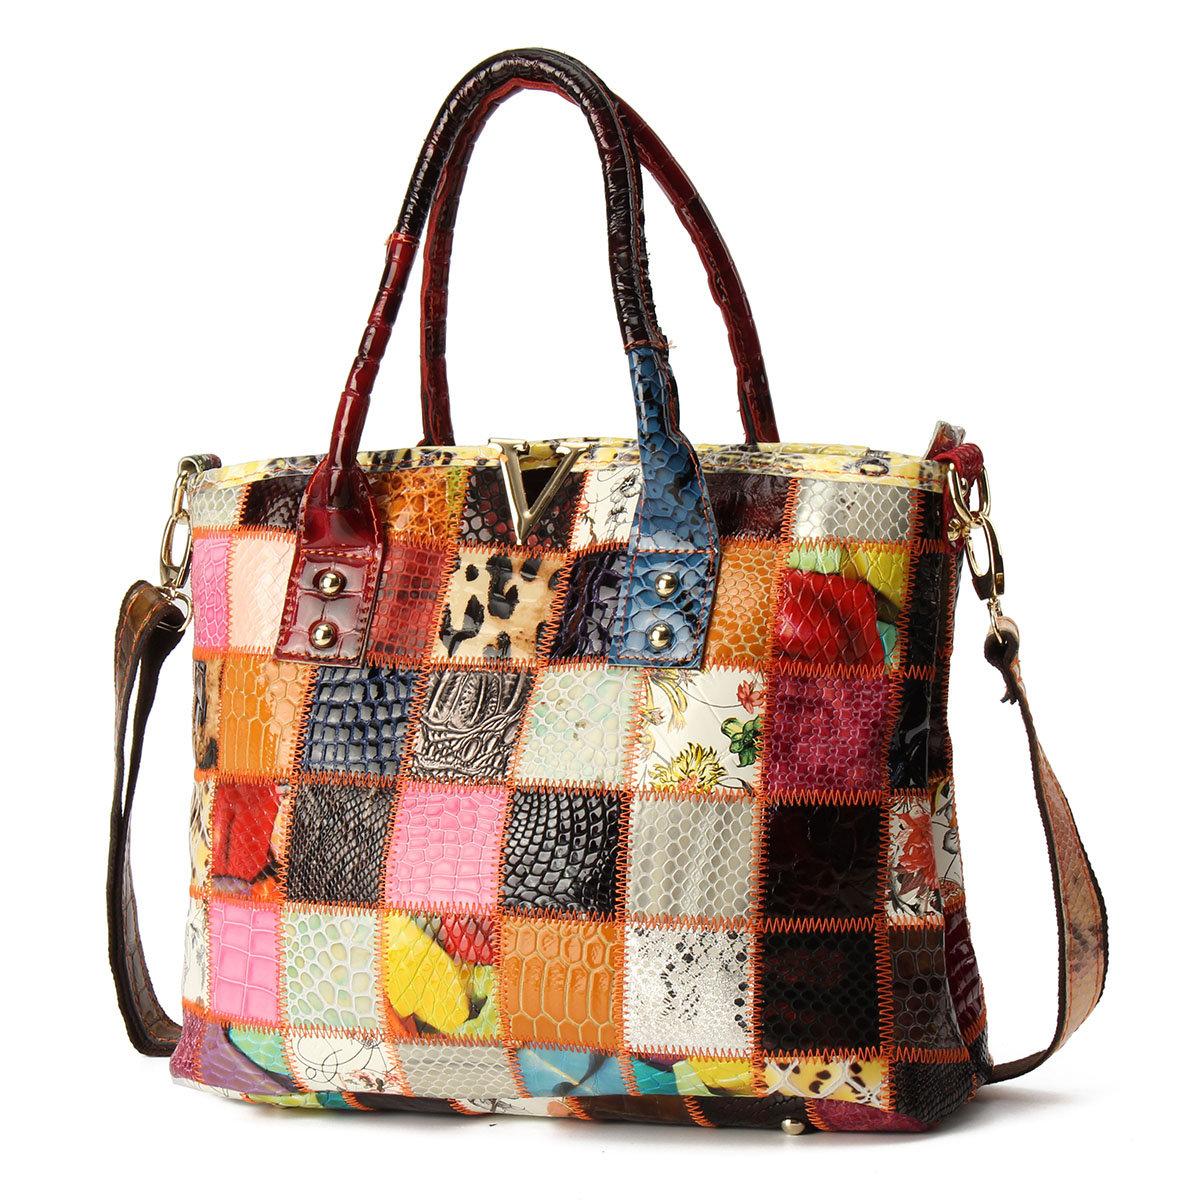 Women Genuine Leather Vintage Tote Handbags Large Capacity Stitching Crossbody Bag